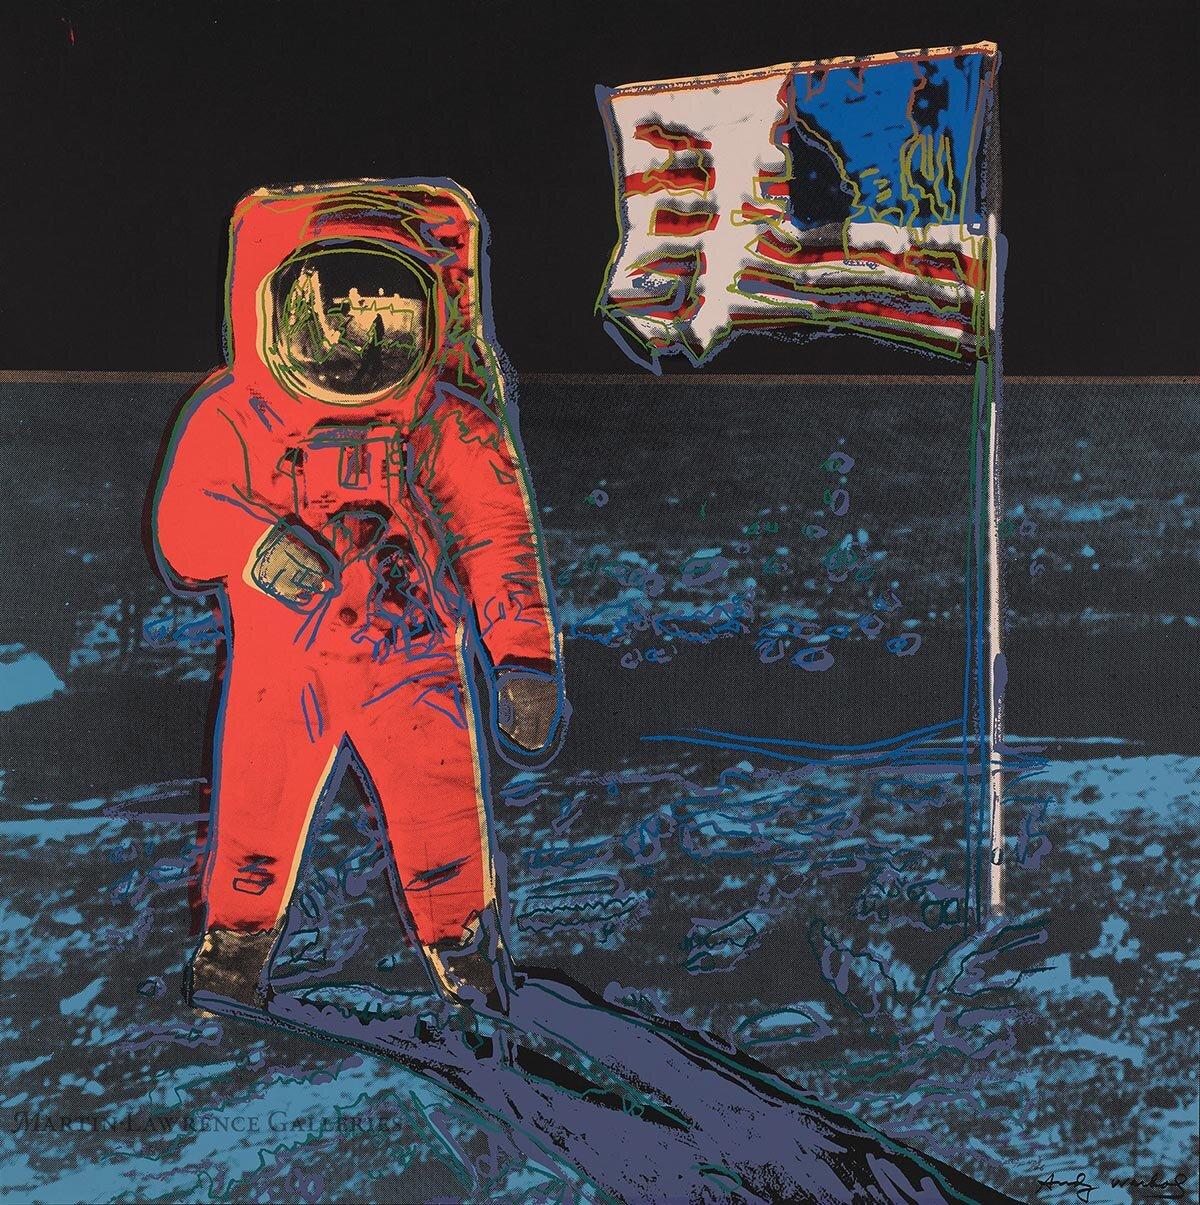 Andy Warhol, Moonwalk, 1987,    unique trial-proof screen print